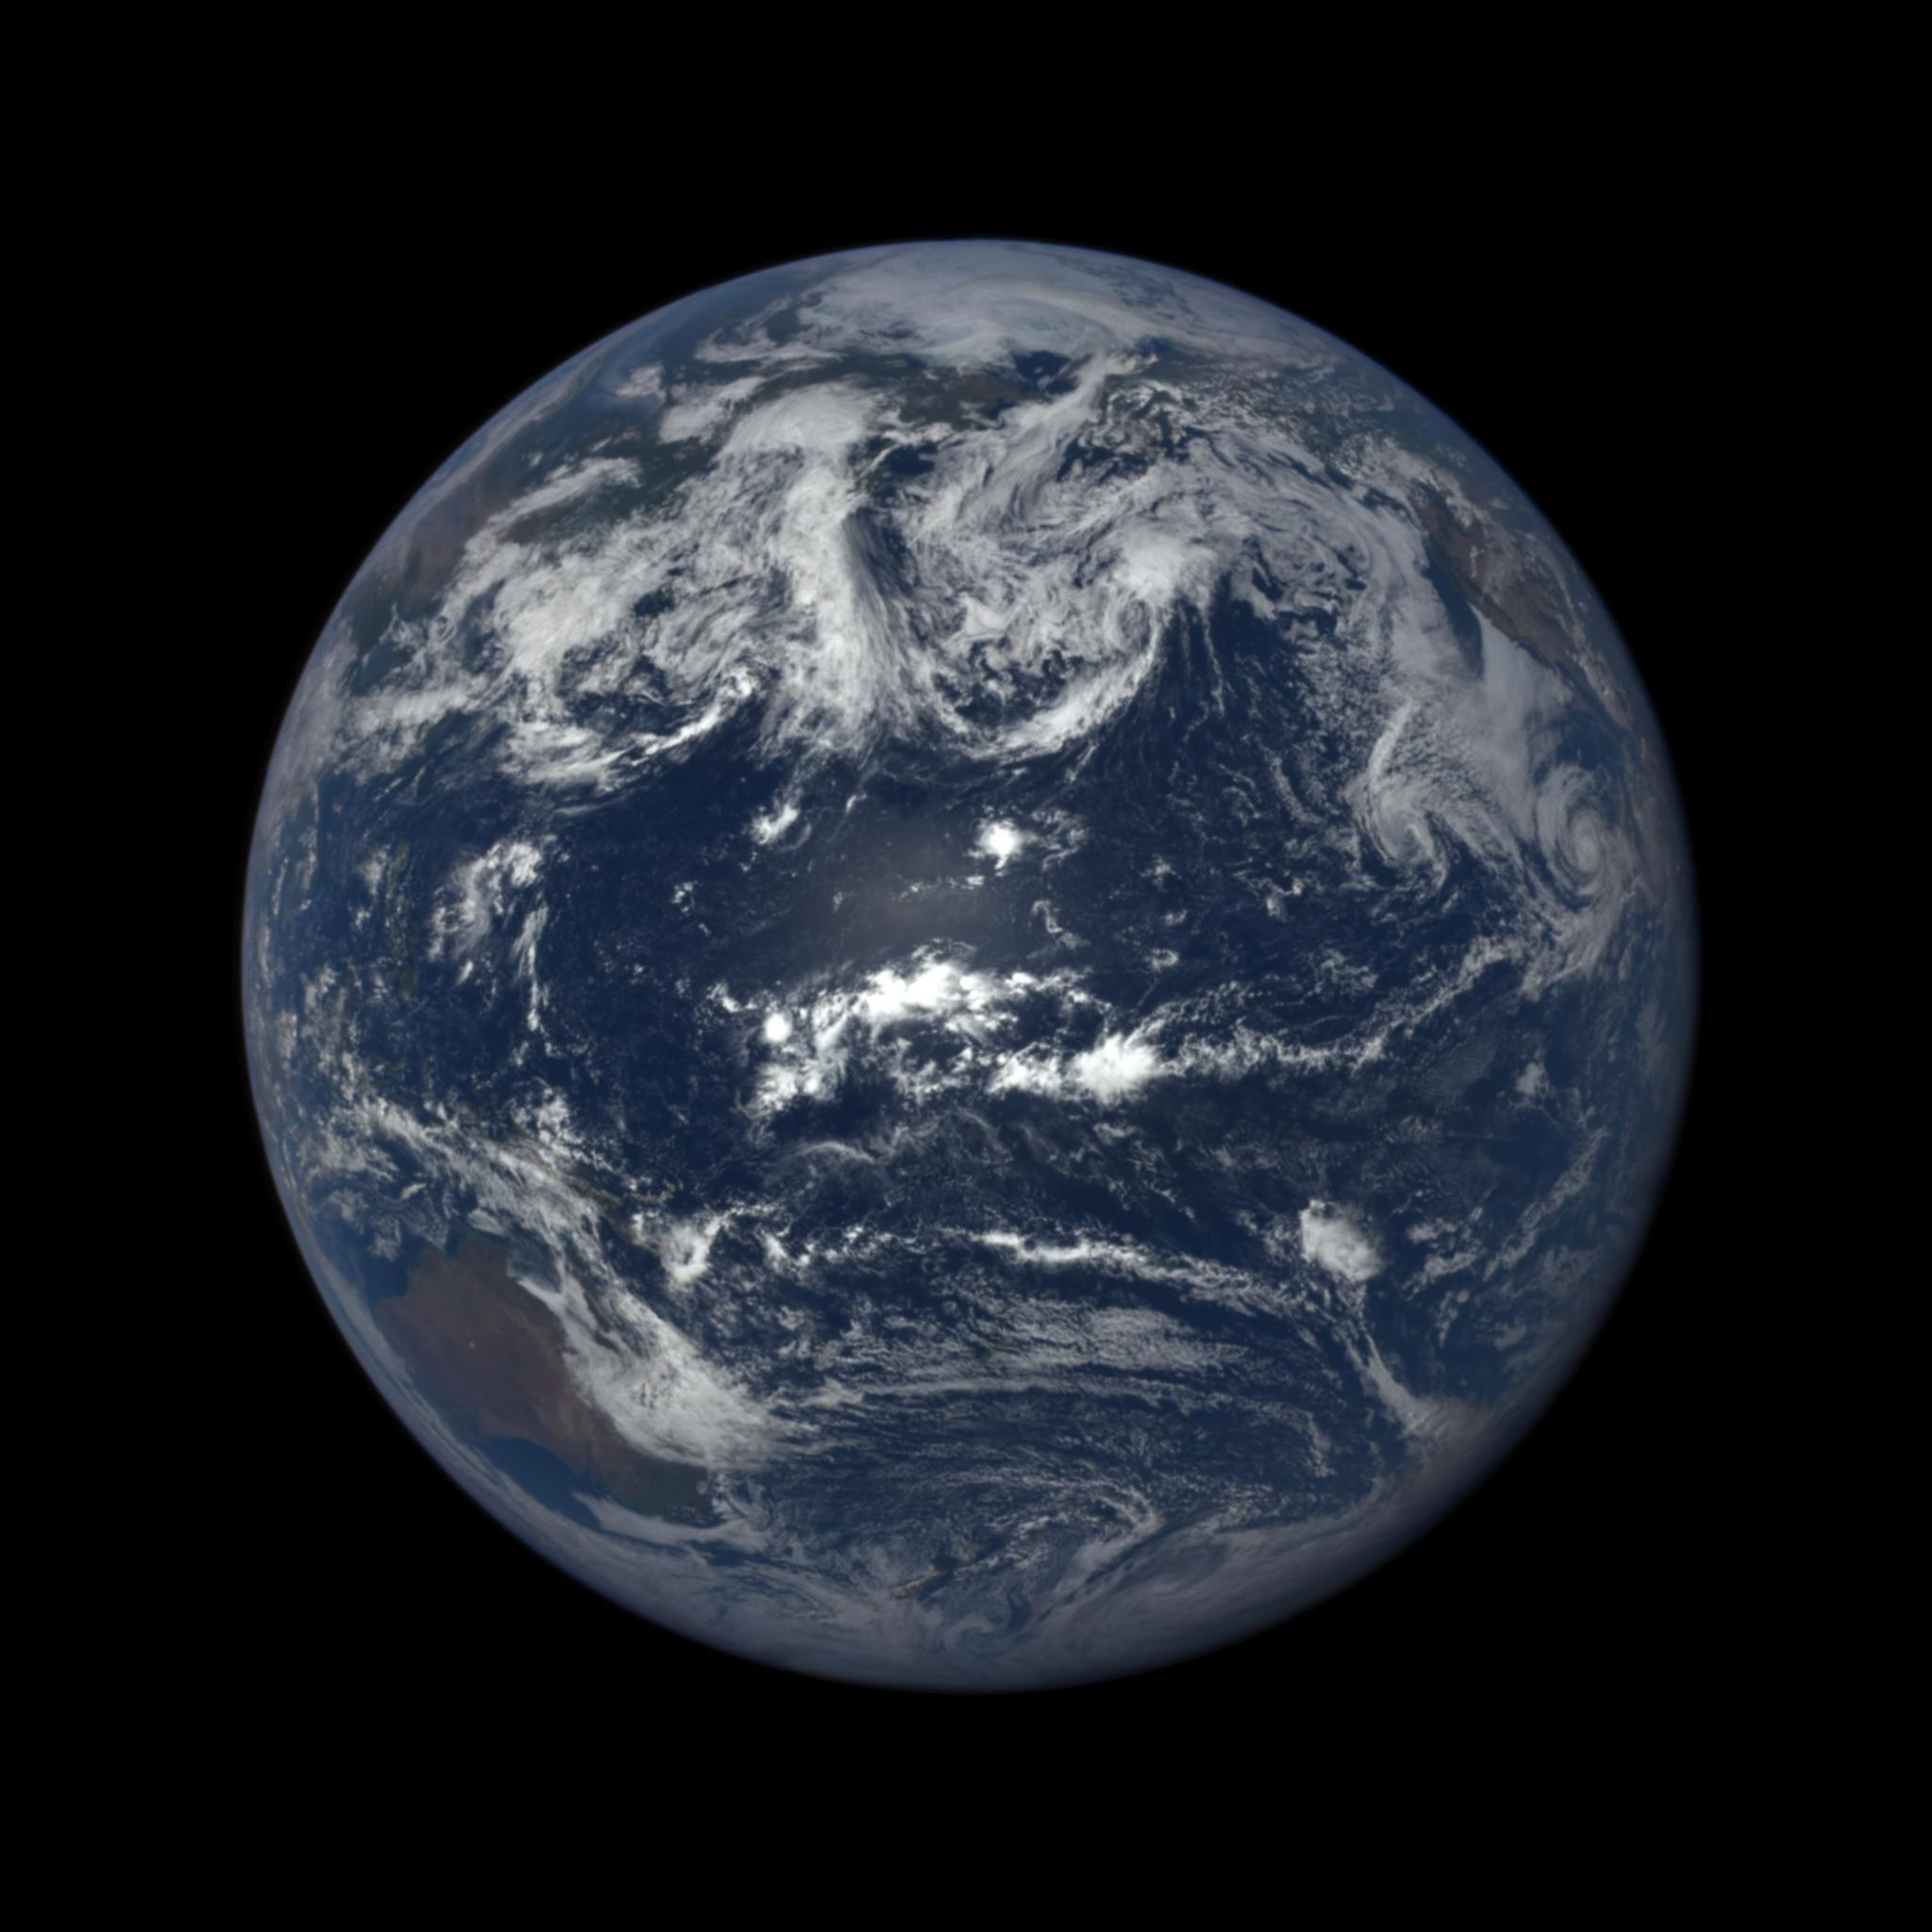 EPIC Earth